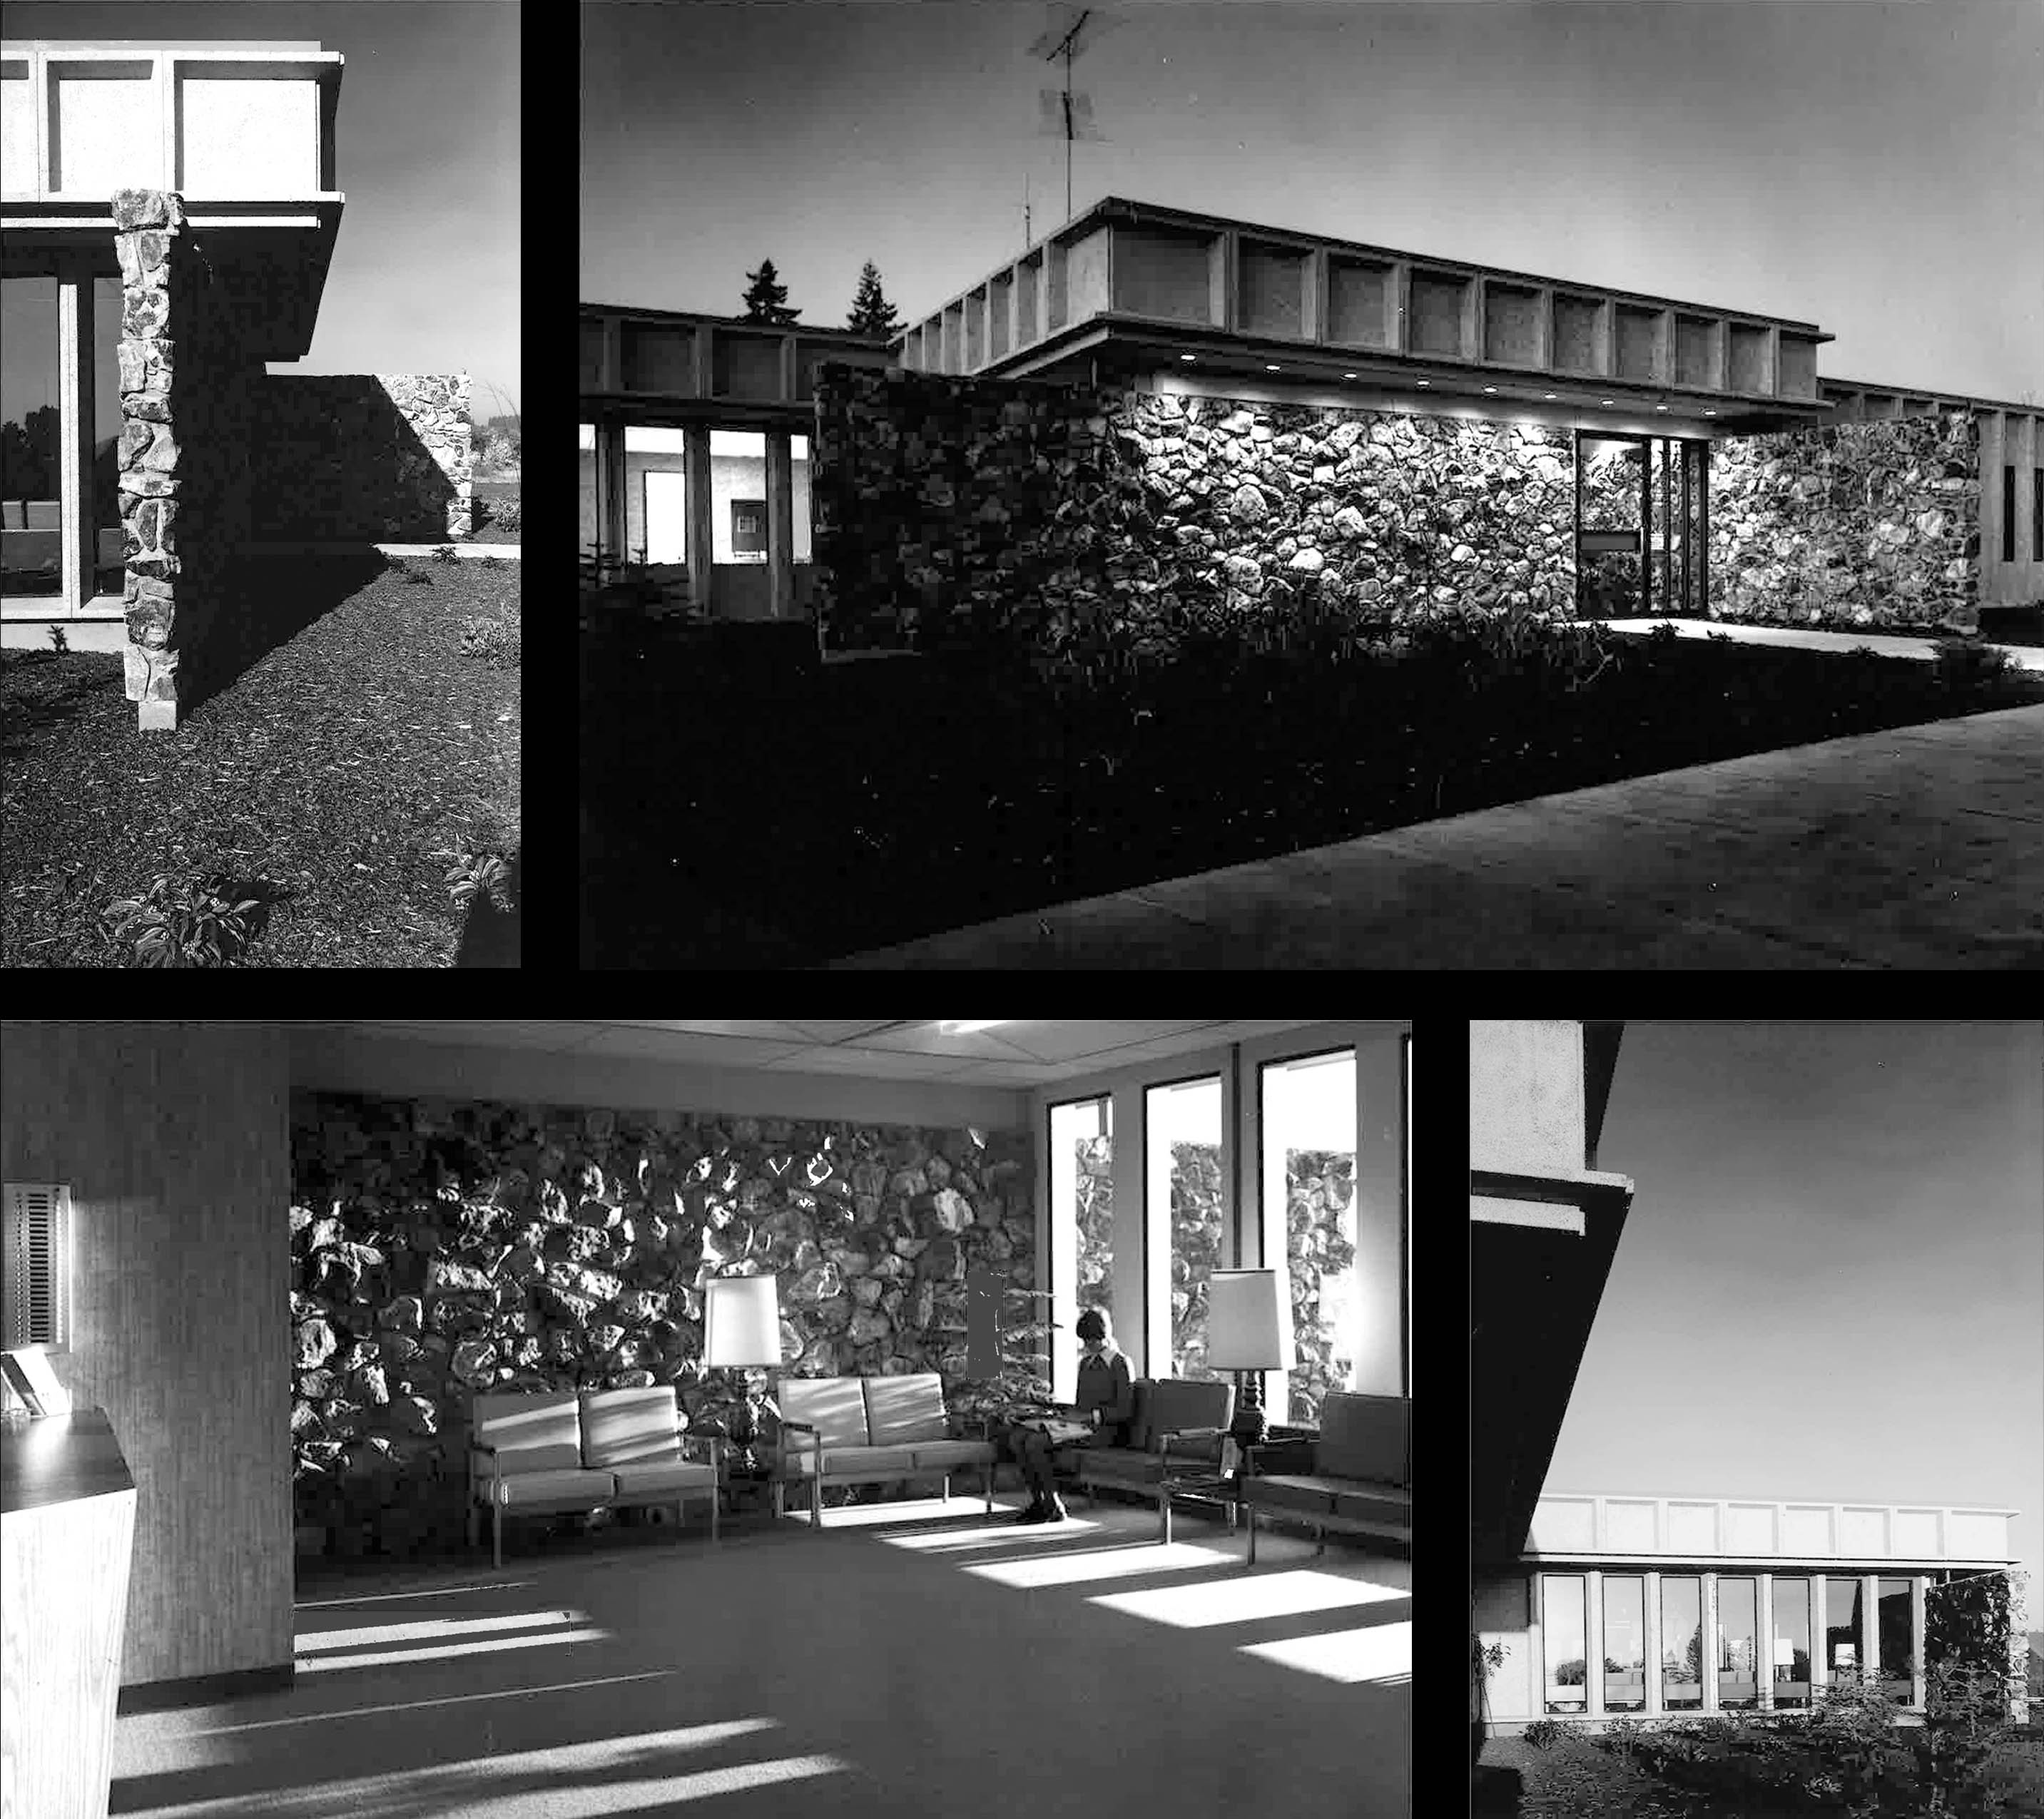 Centralia Hospital Collage (1967)